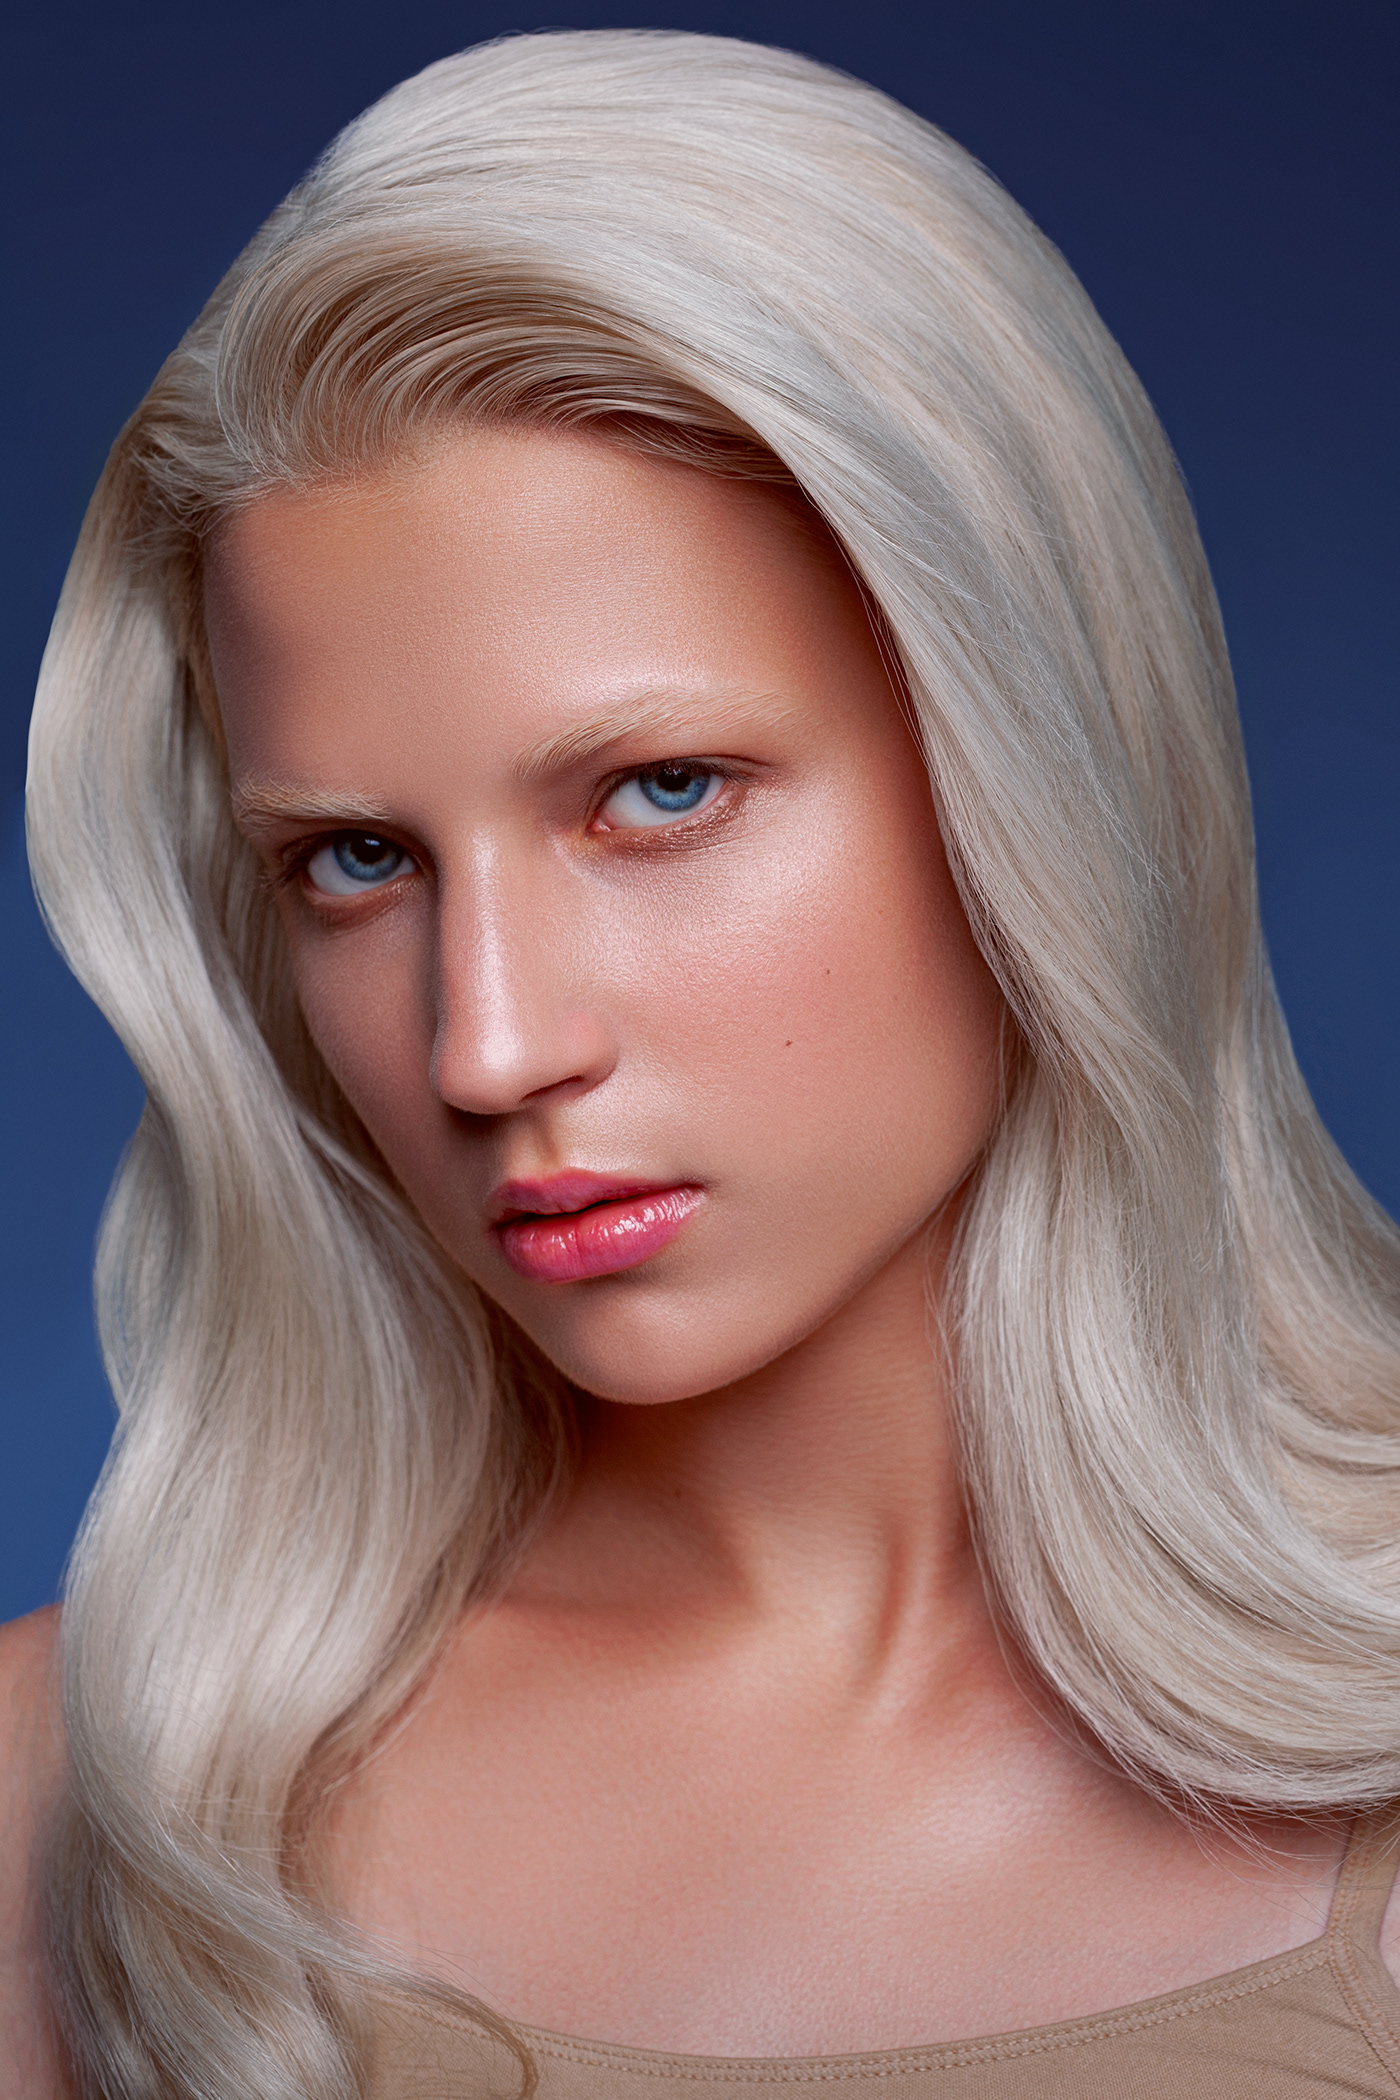 beauty Fashion  makeup photoshop portrait retouch retouching  blond Indigo